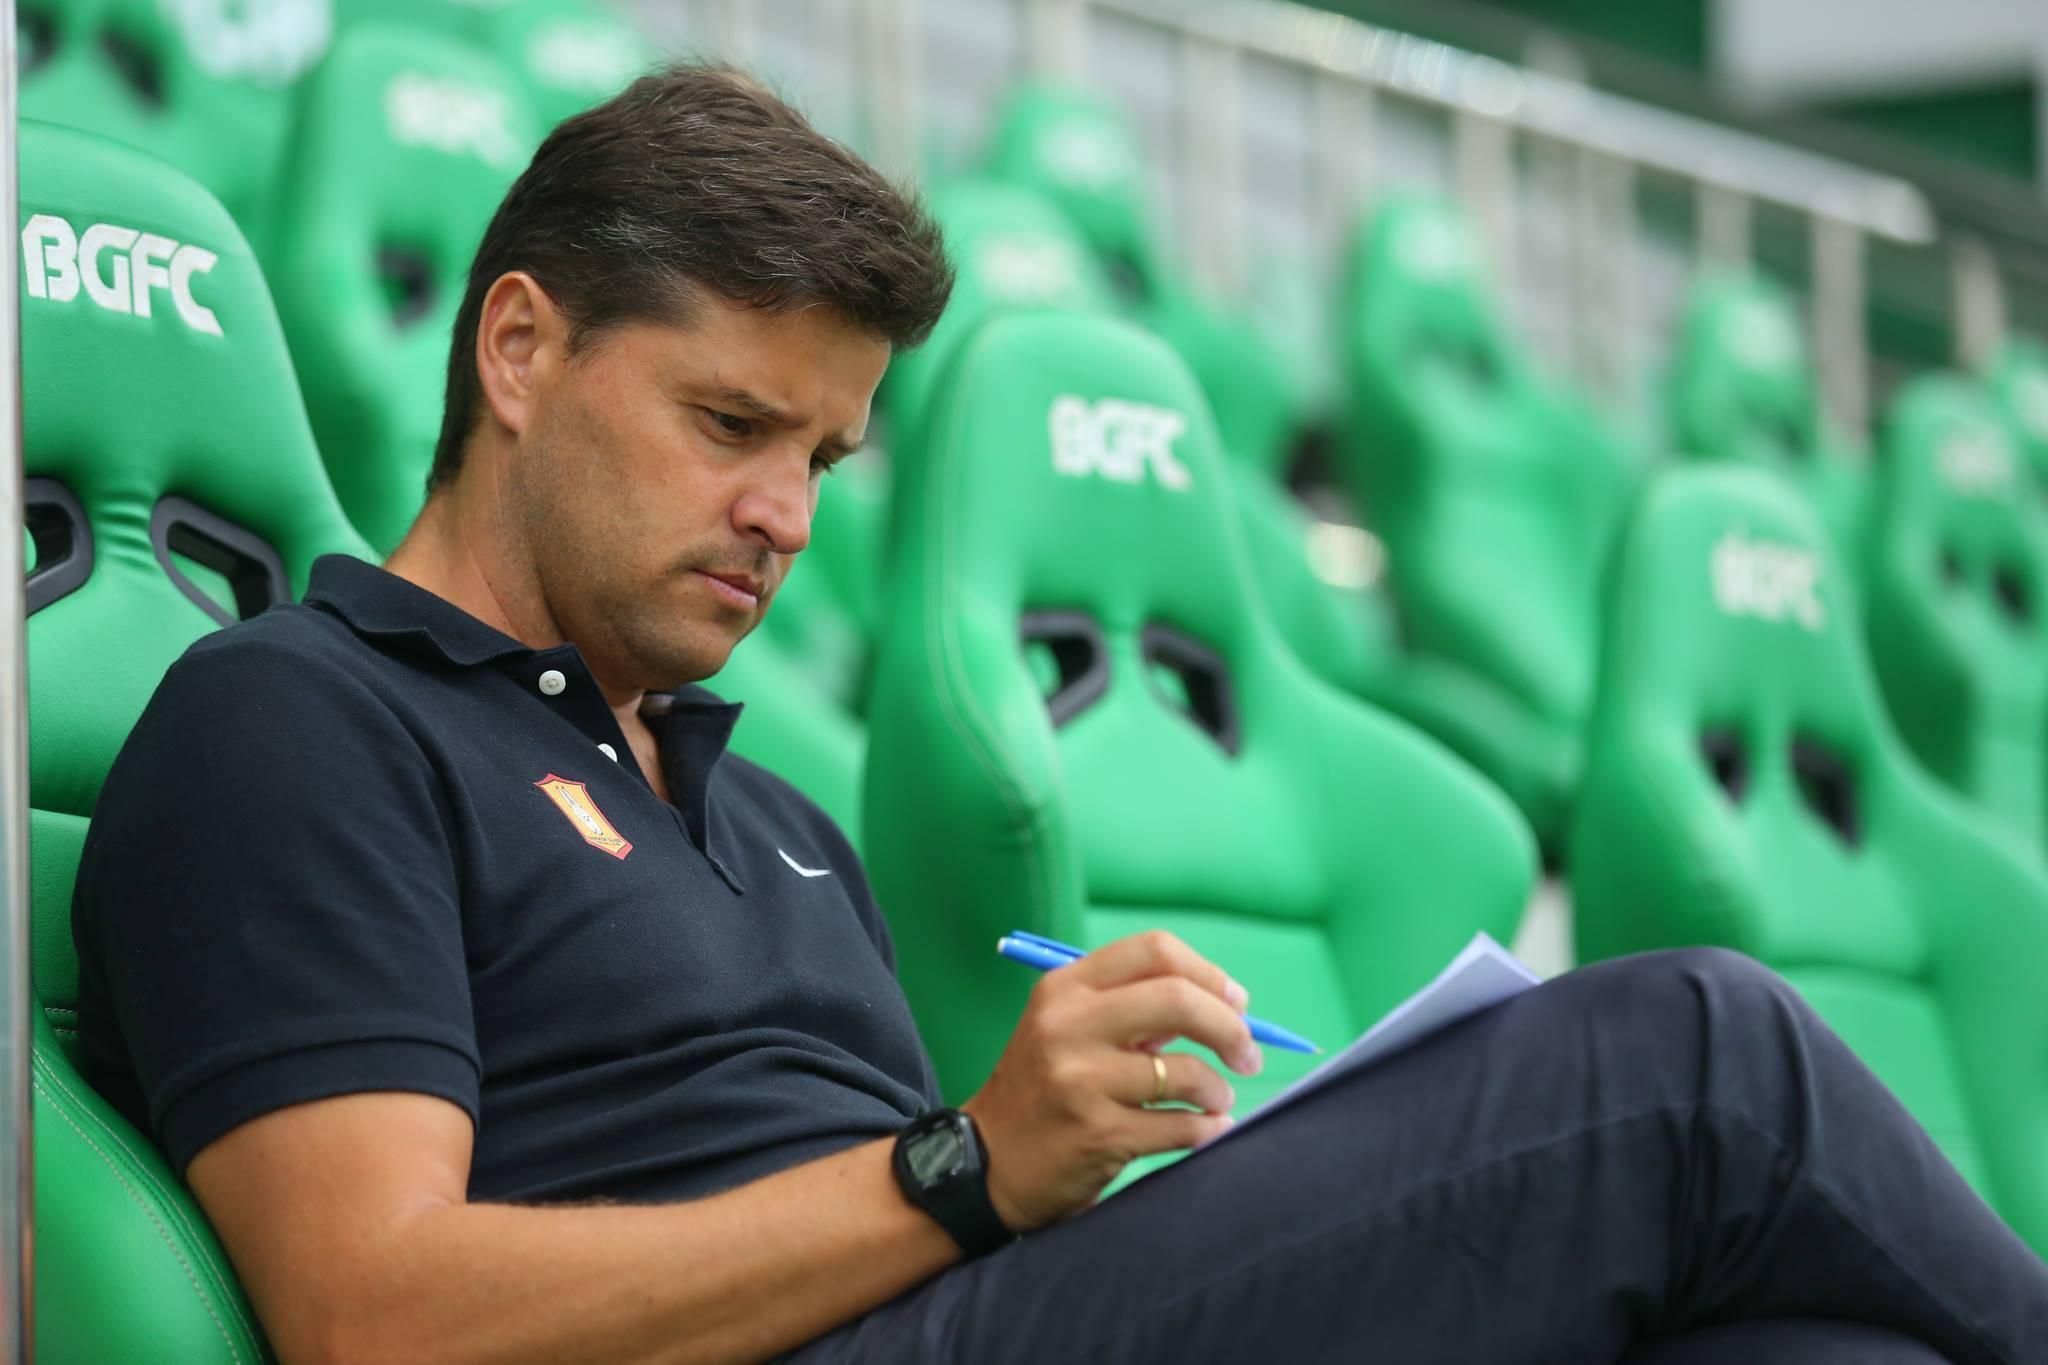 Former BG Boss Ricardo Rodriguez Prepares for J-League Promotion Playoff With Tokushima Vortis